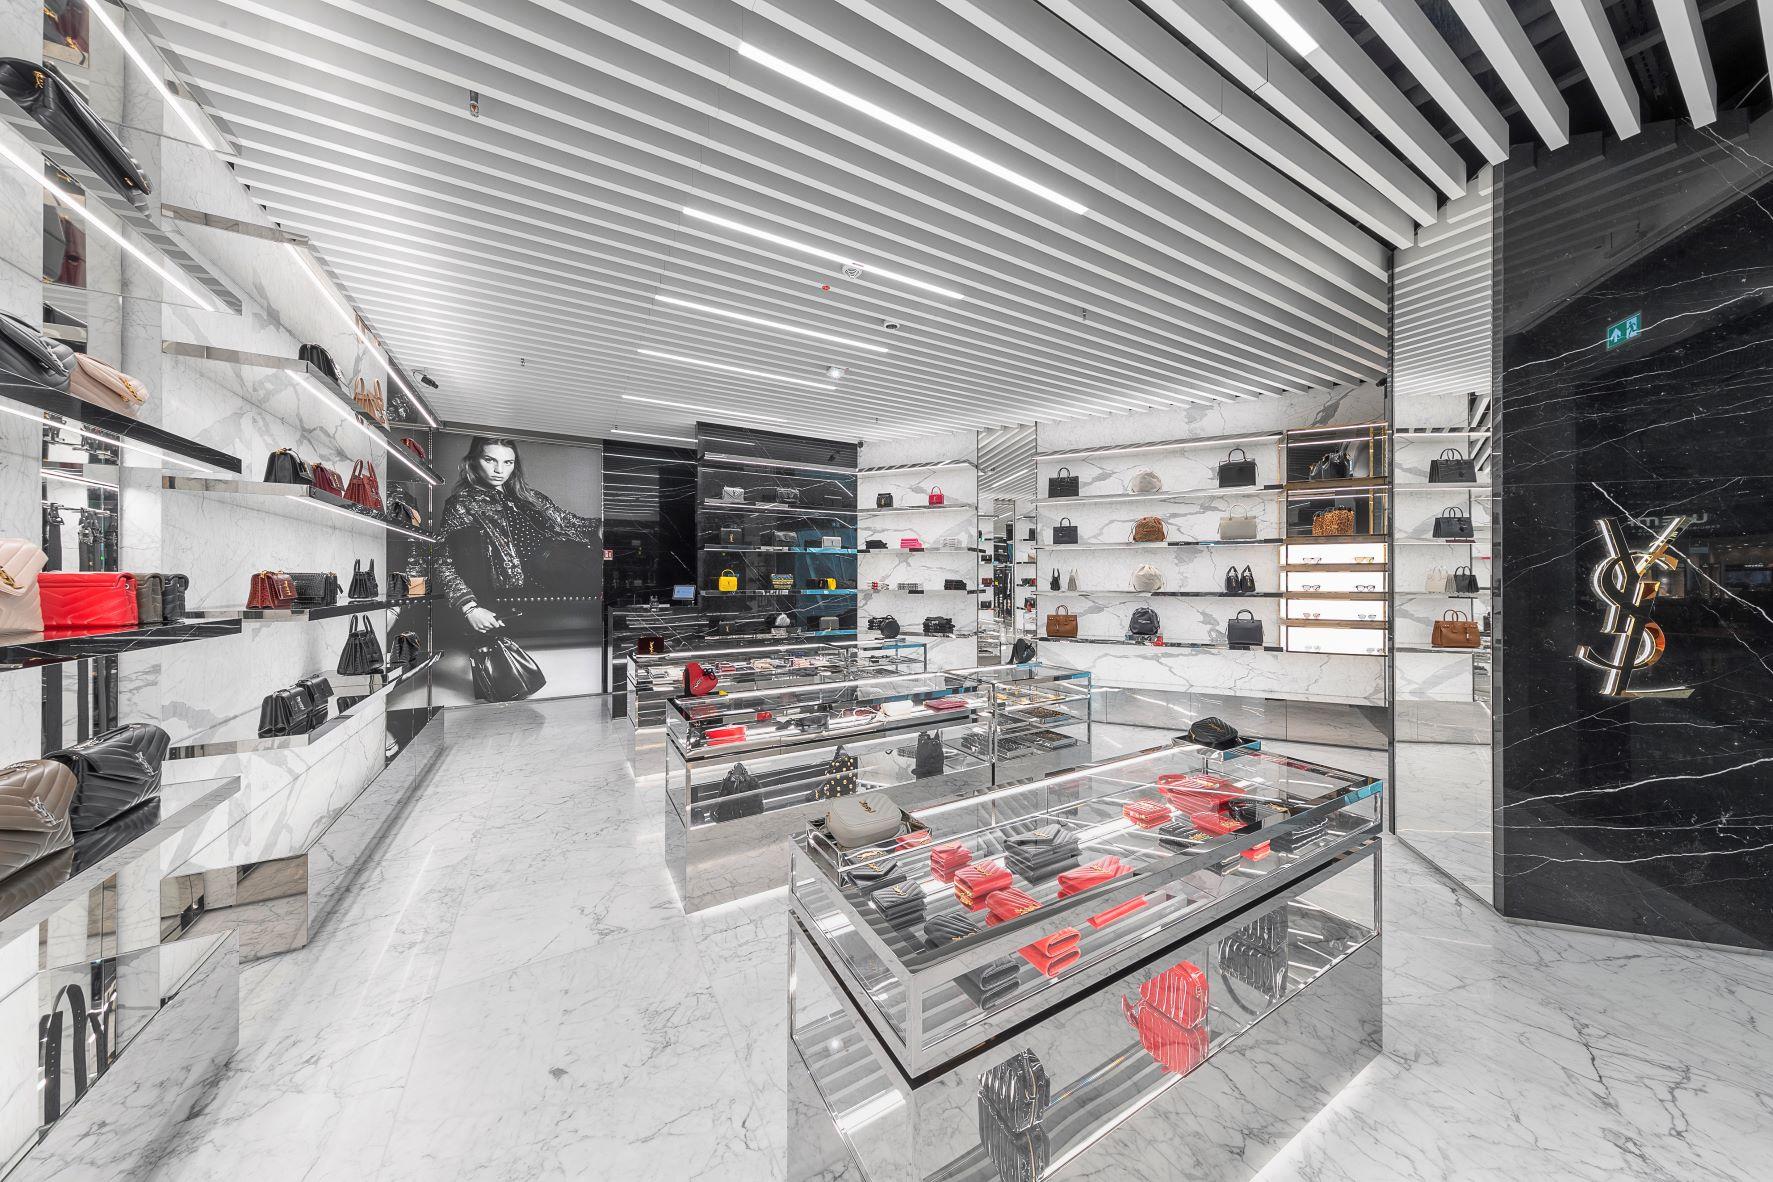 Yves-Saint-Laurent-Shop im Flughafen Frankfurt